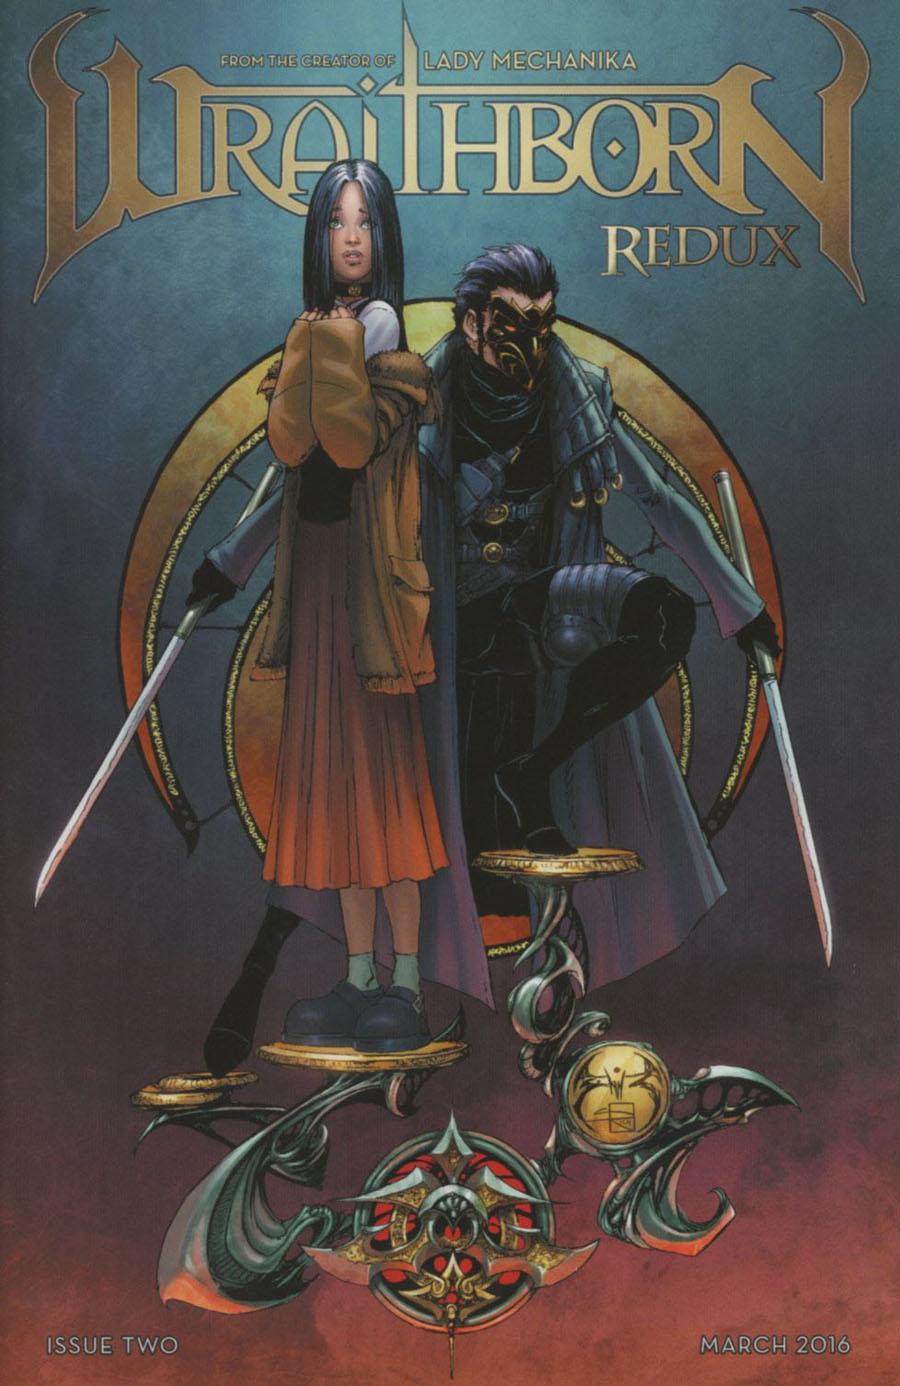 Wraithborn Redux #2 Cover A Regular Joe Benitez & Sabine Rich Cover